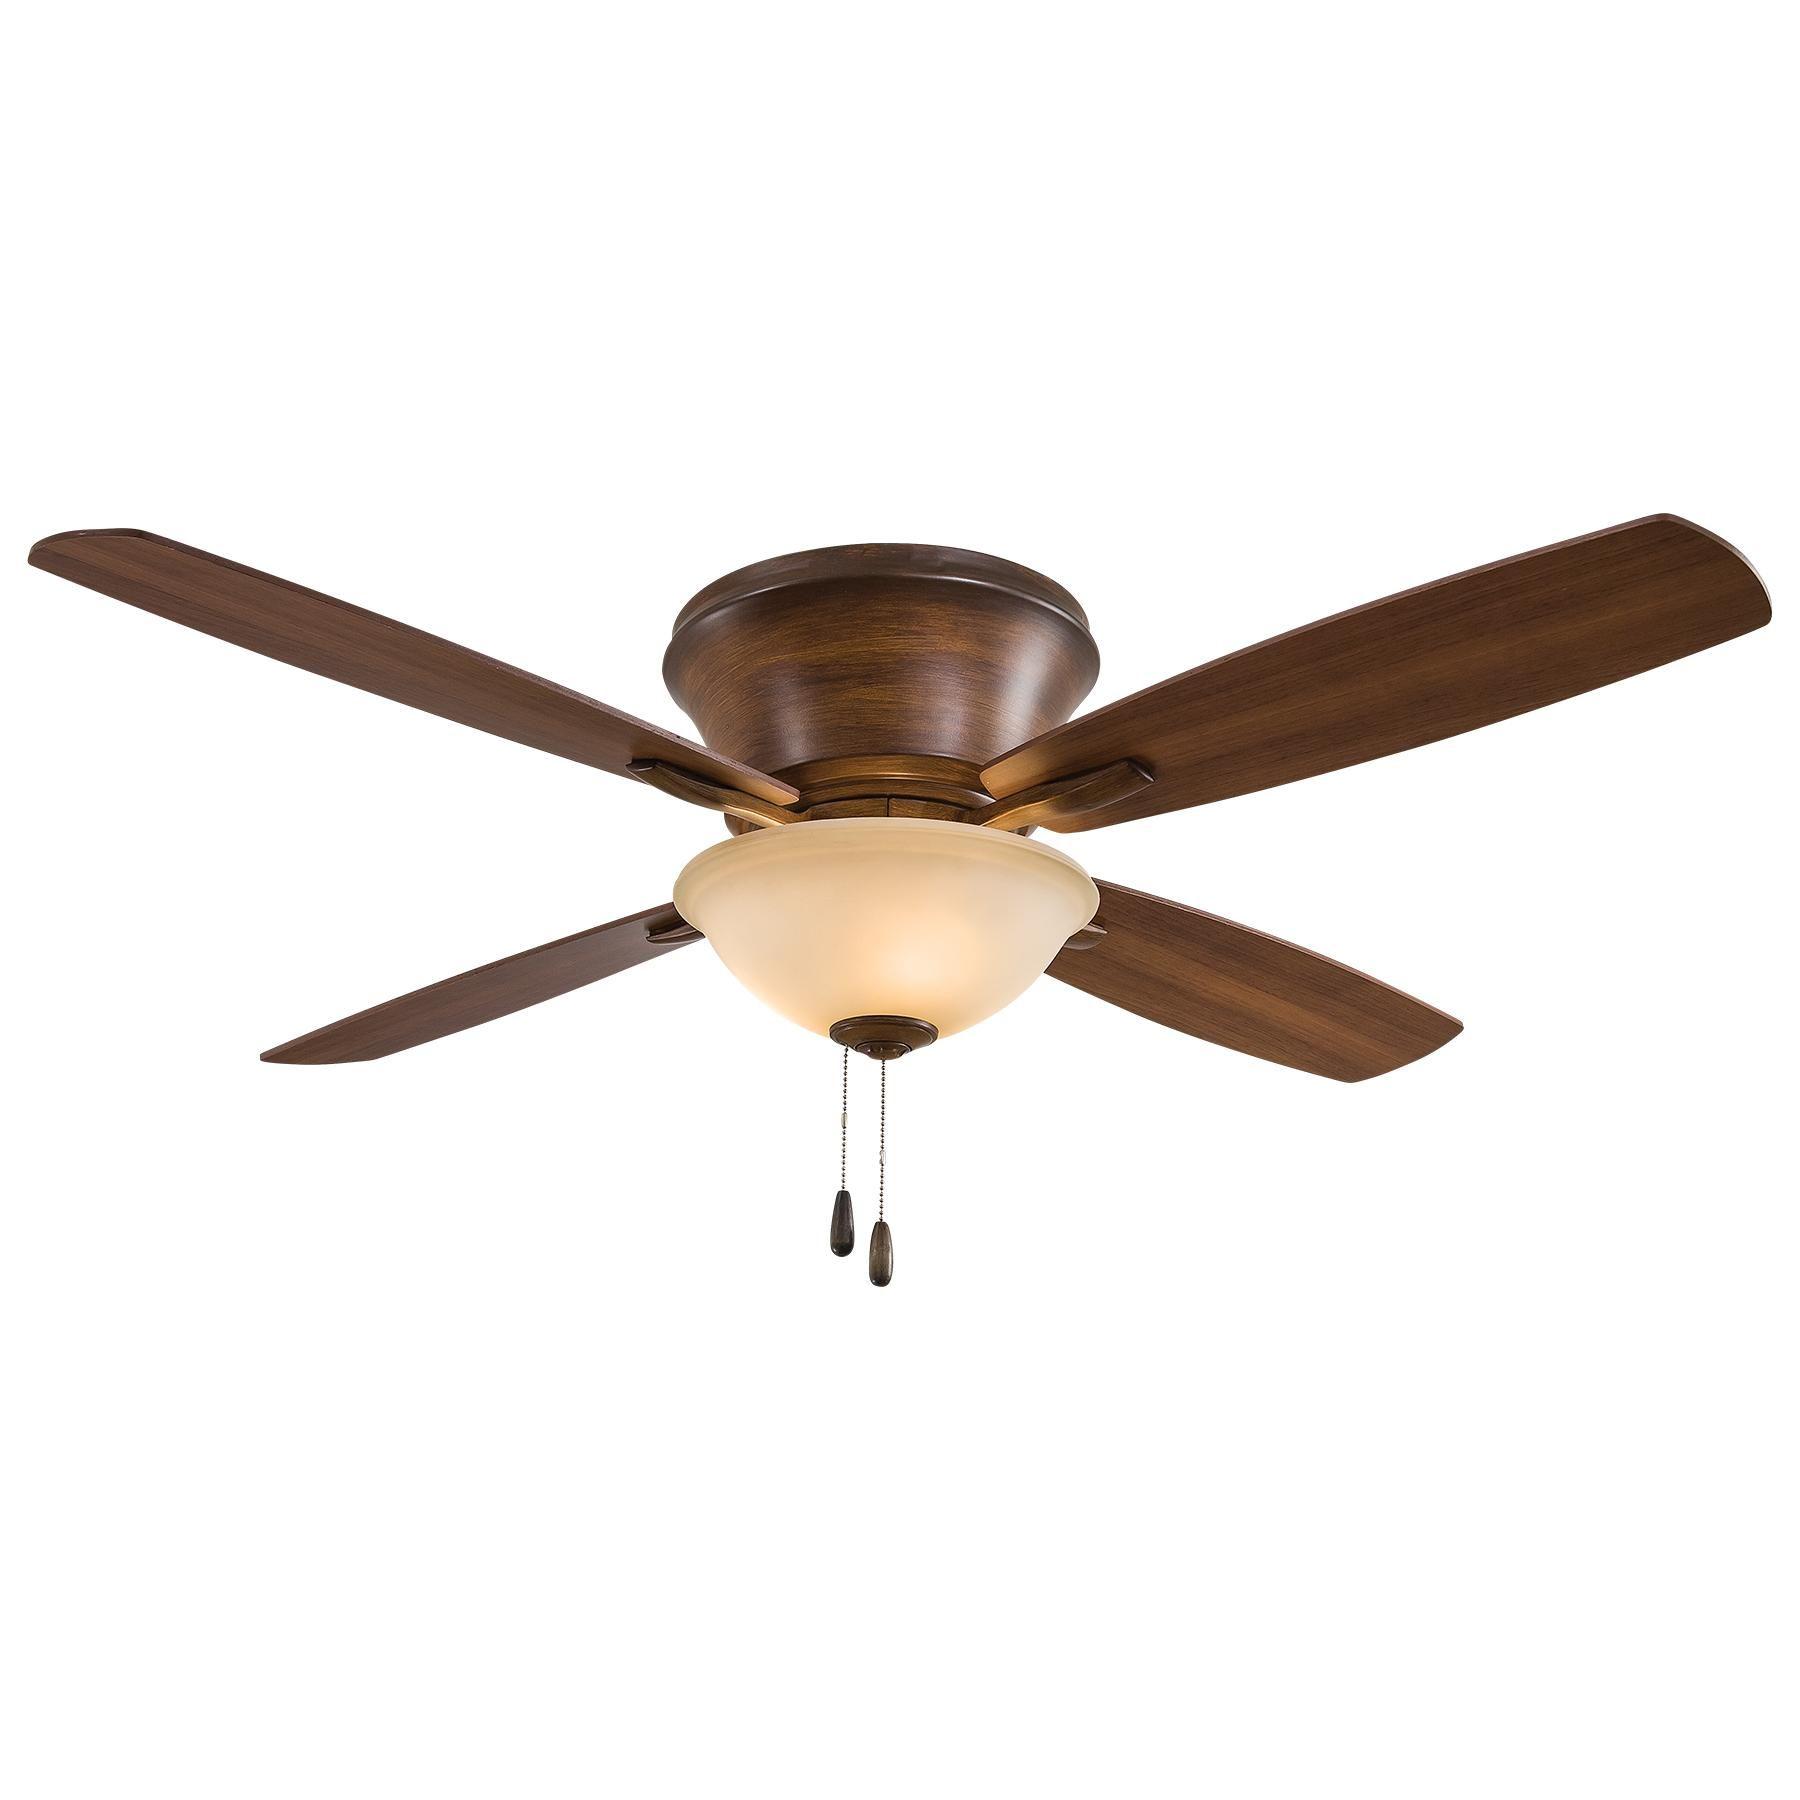 unique light location bronze home fan oil of cruza rubbed wet ceiling vera lovely lighting kit